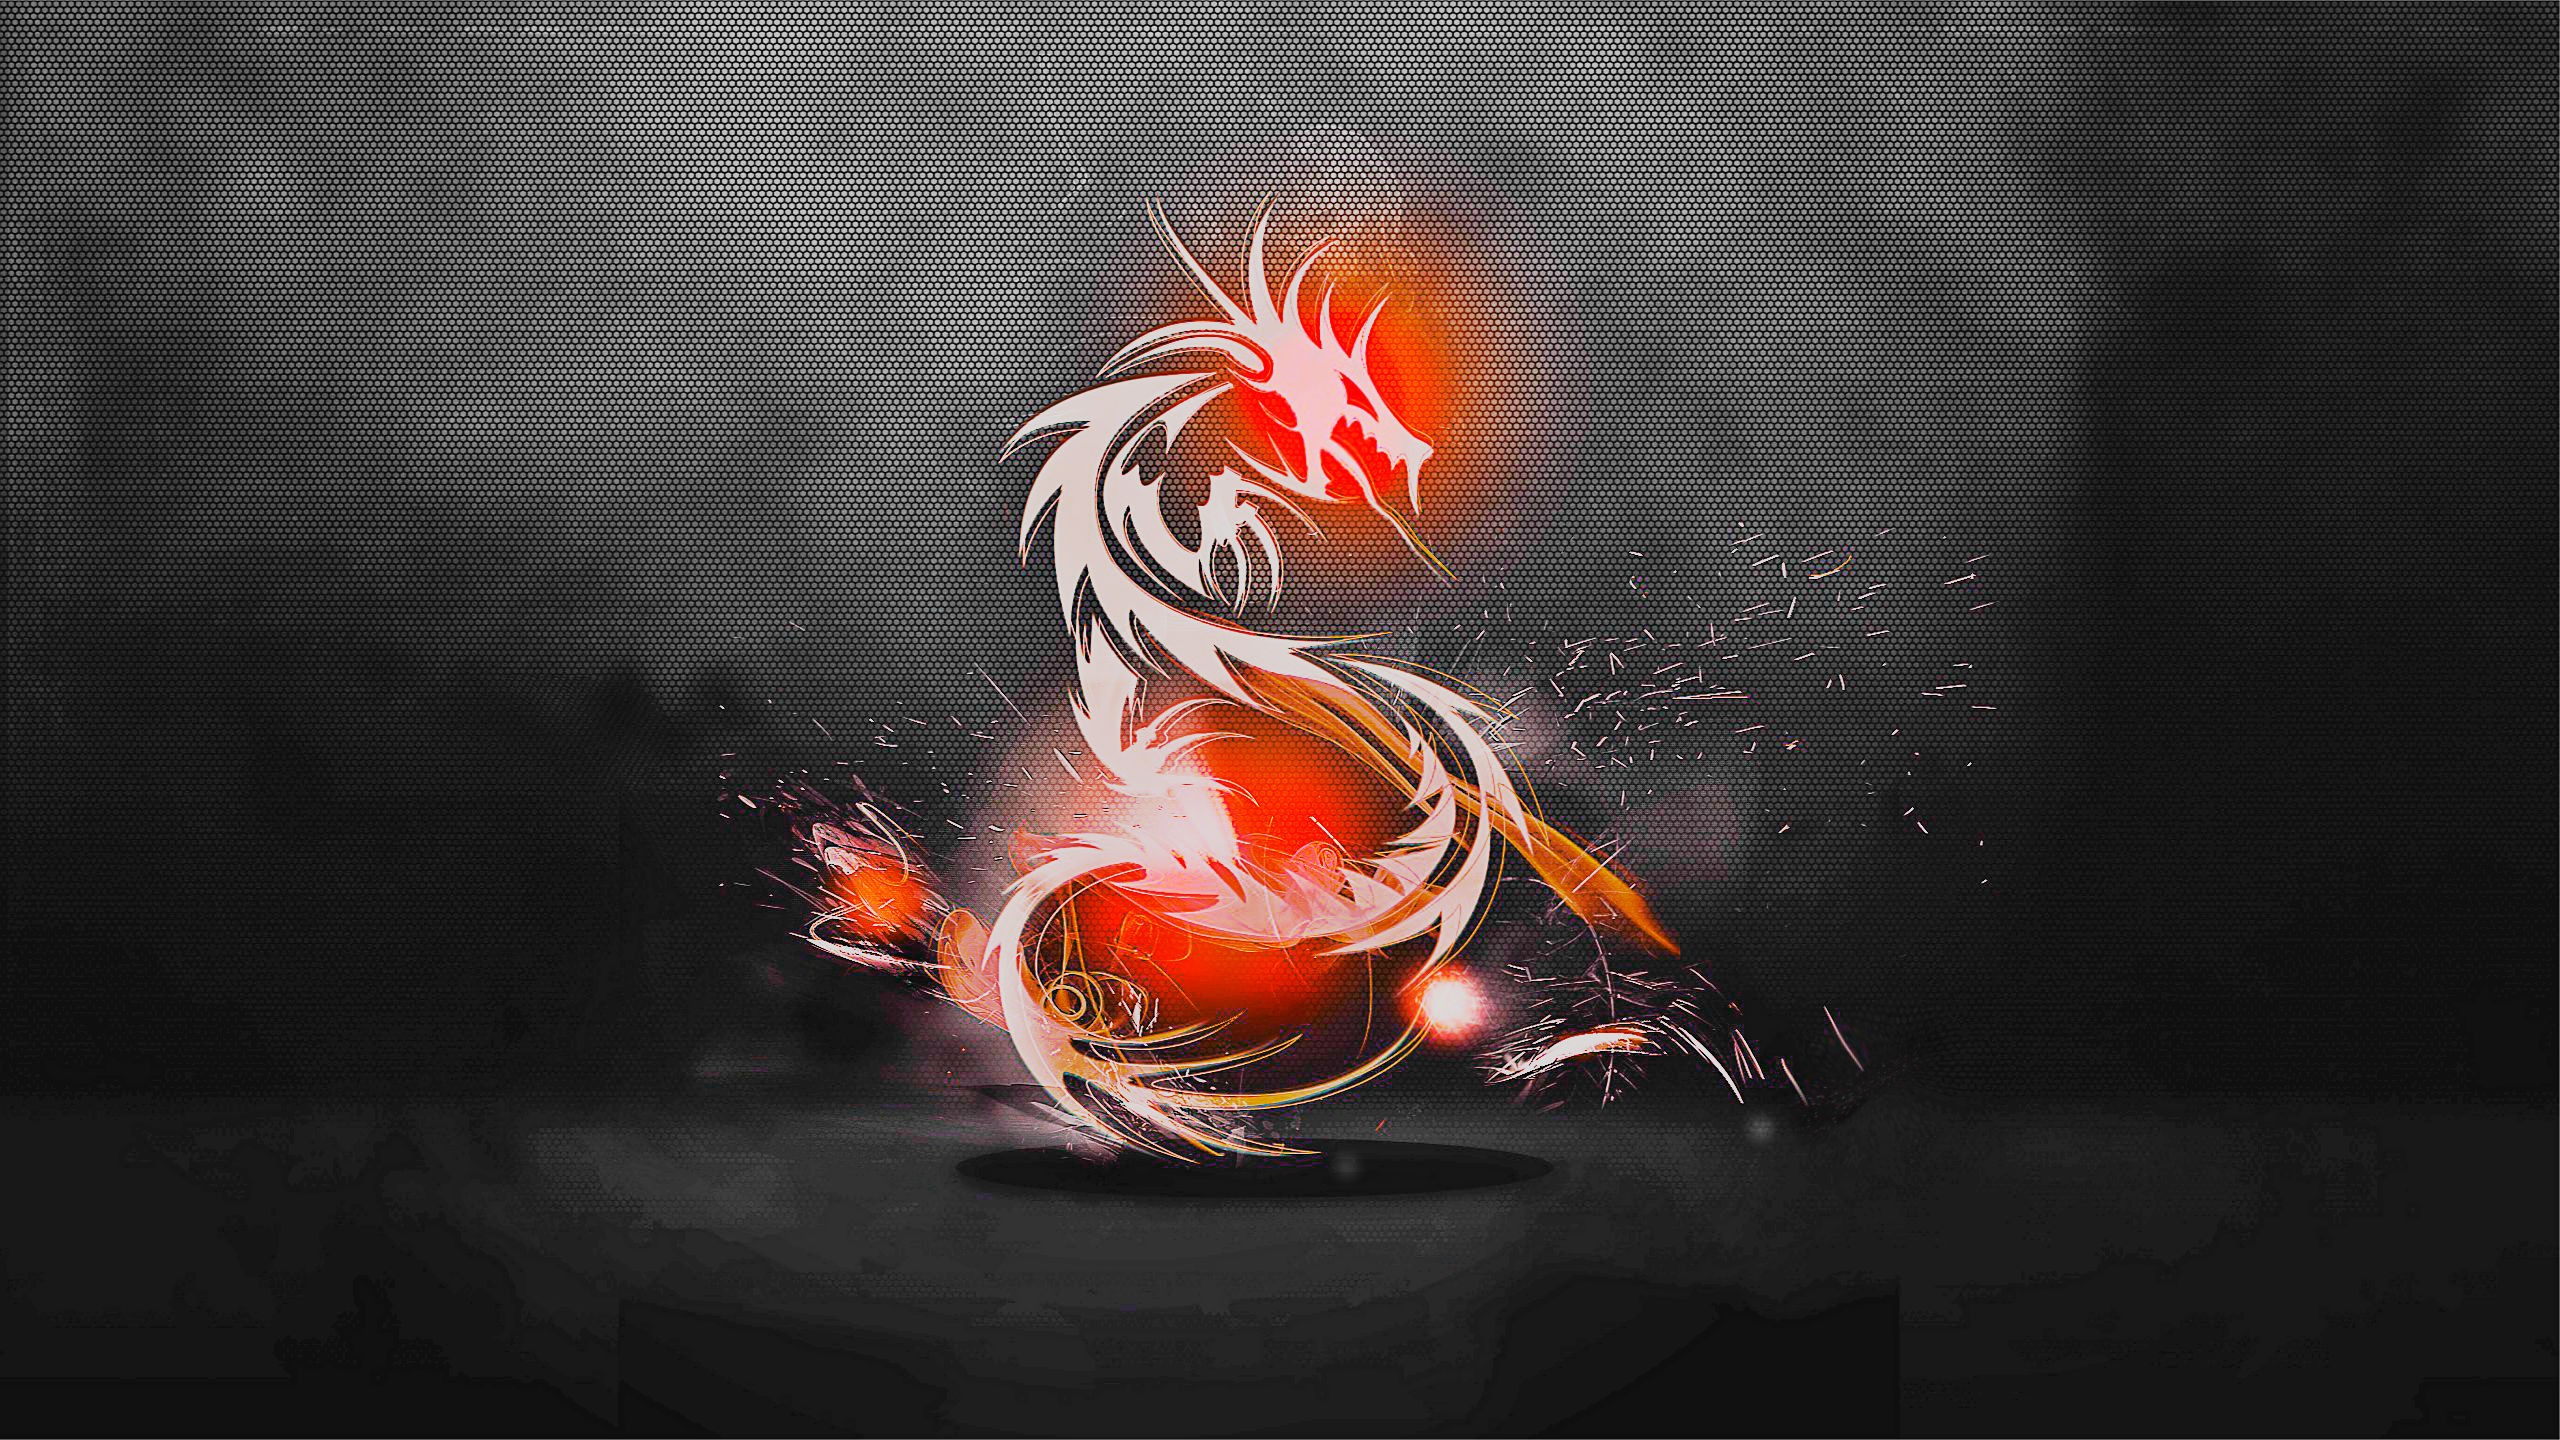 Cool Red Dragon Wallpaper Abstract dragons wallpaper 2560x1440